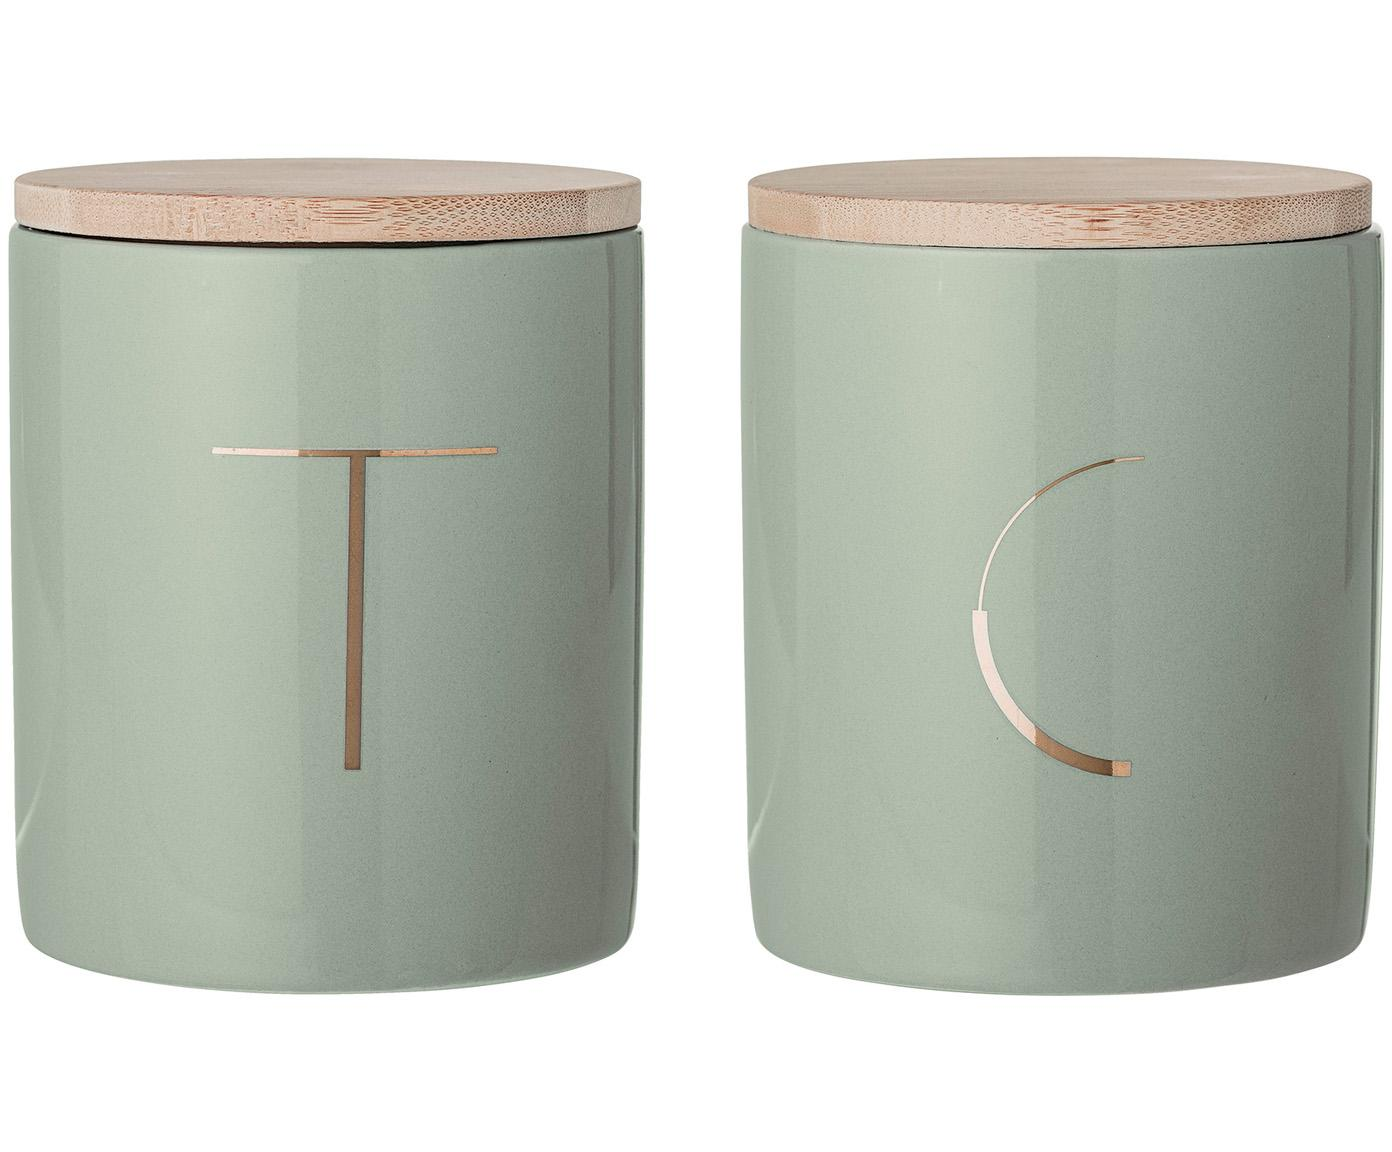 Opbergpotten Aileen, 2-delig., Doos: aardewerk, Deksel: bamboe, siliconen, Mintgroen, bamboehout, Ø 10 x H 13 cm